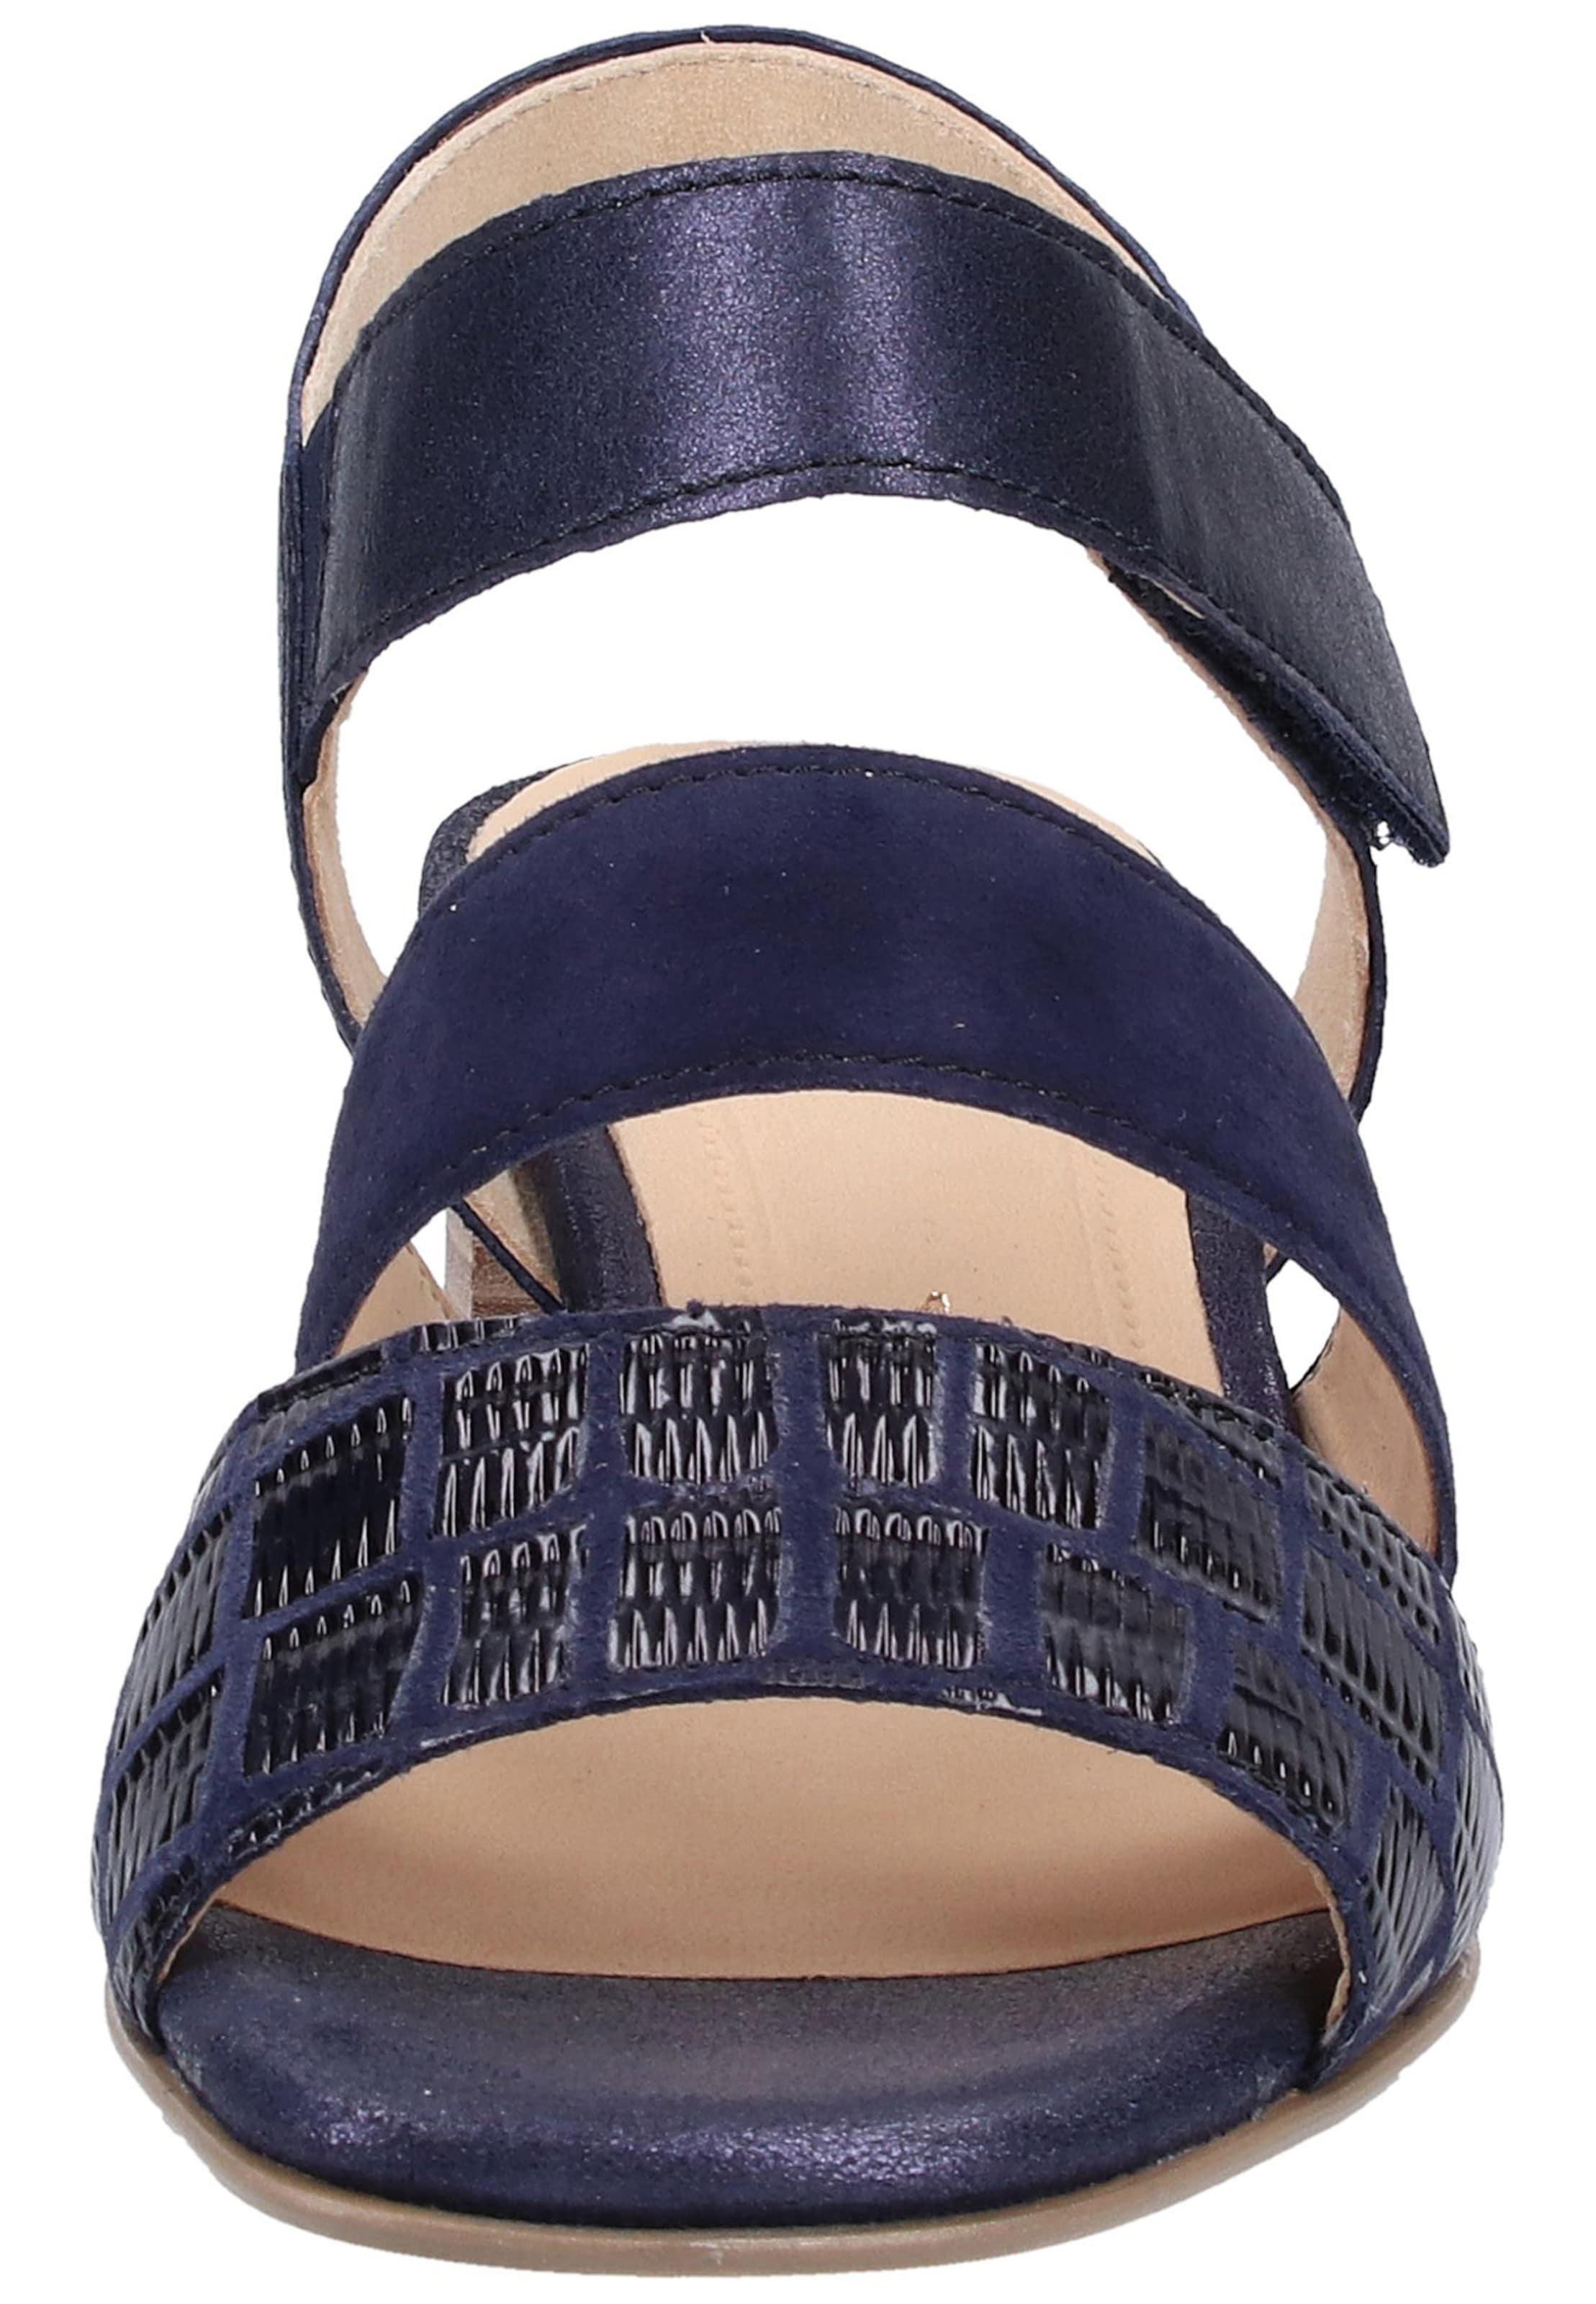 Sandales À Bleu Gabor En Lanières NuitFoncé v6IYybf7gm